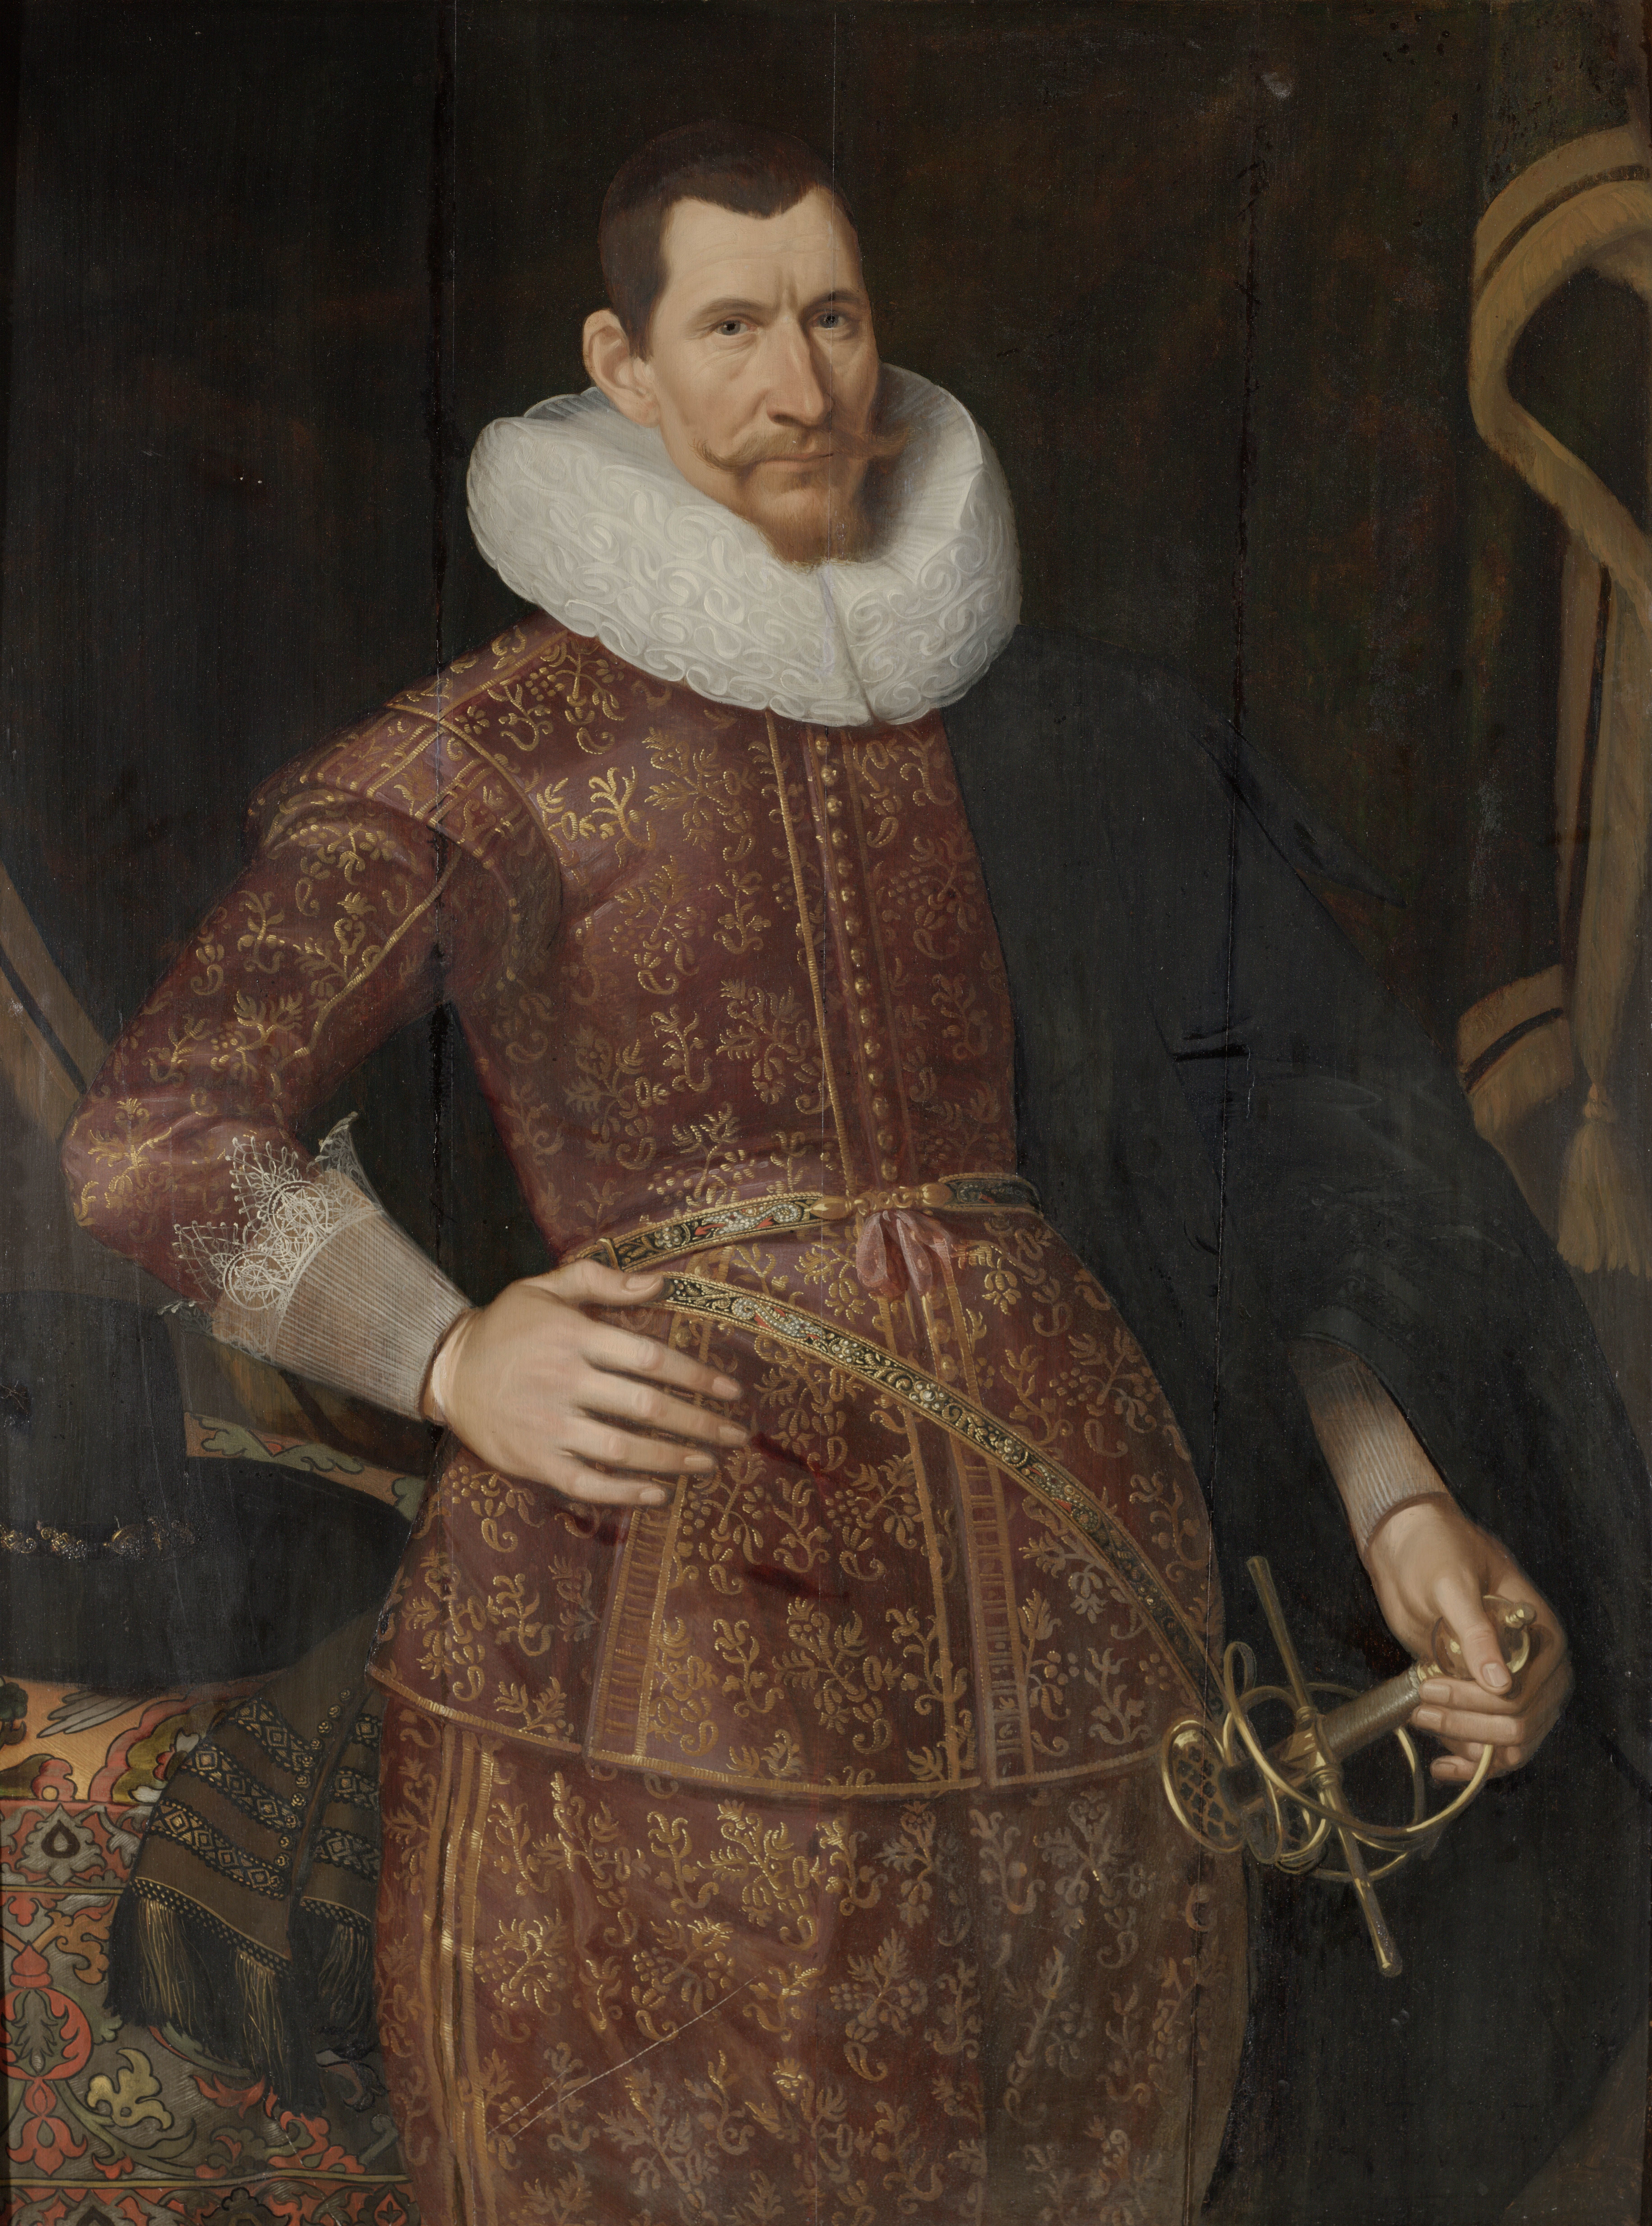 Jan Pieterszoon Coen by Jacob Waben.